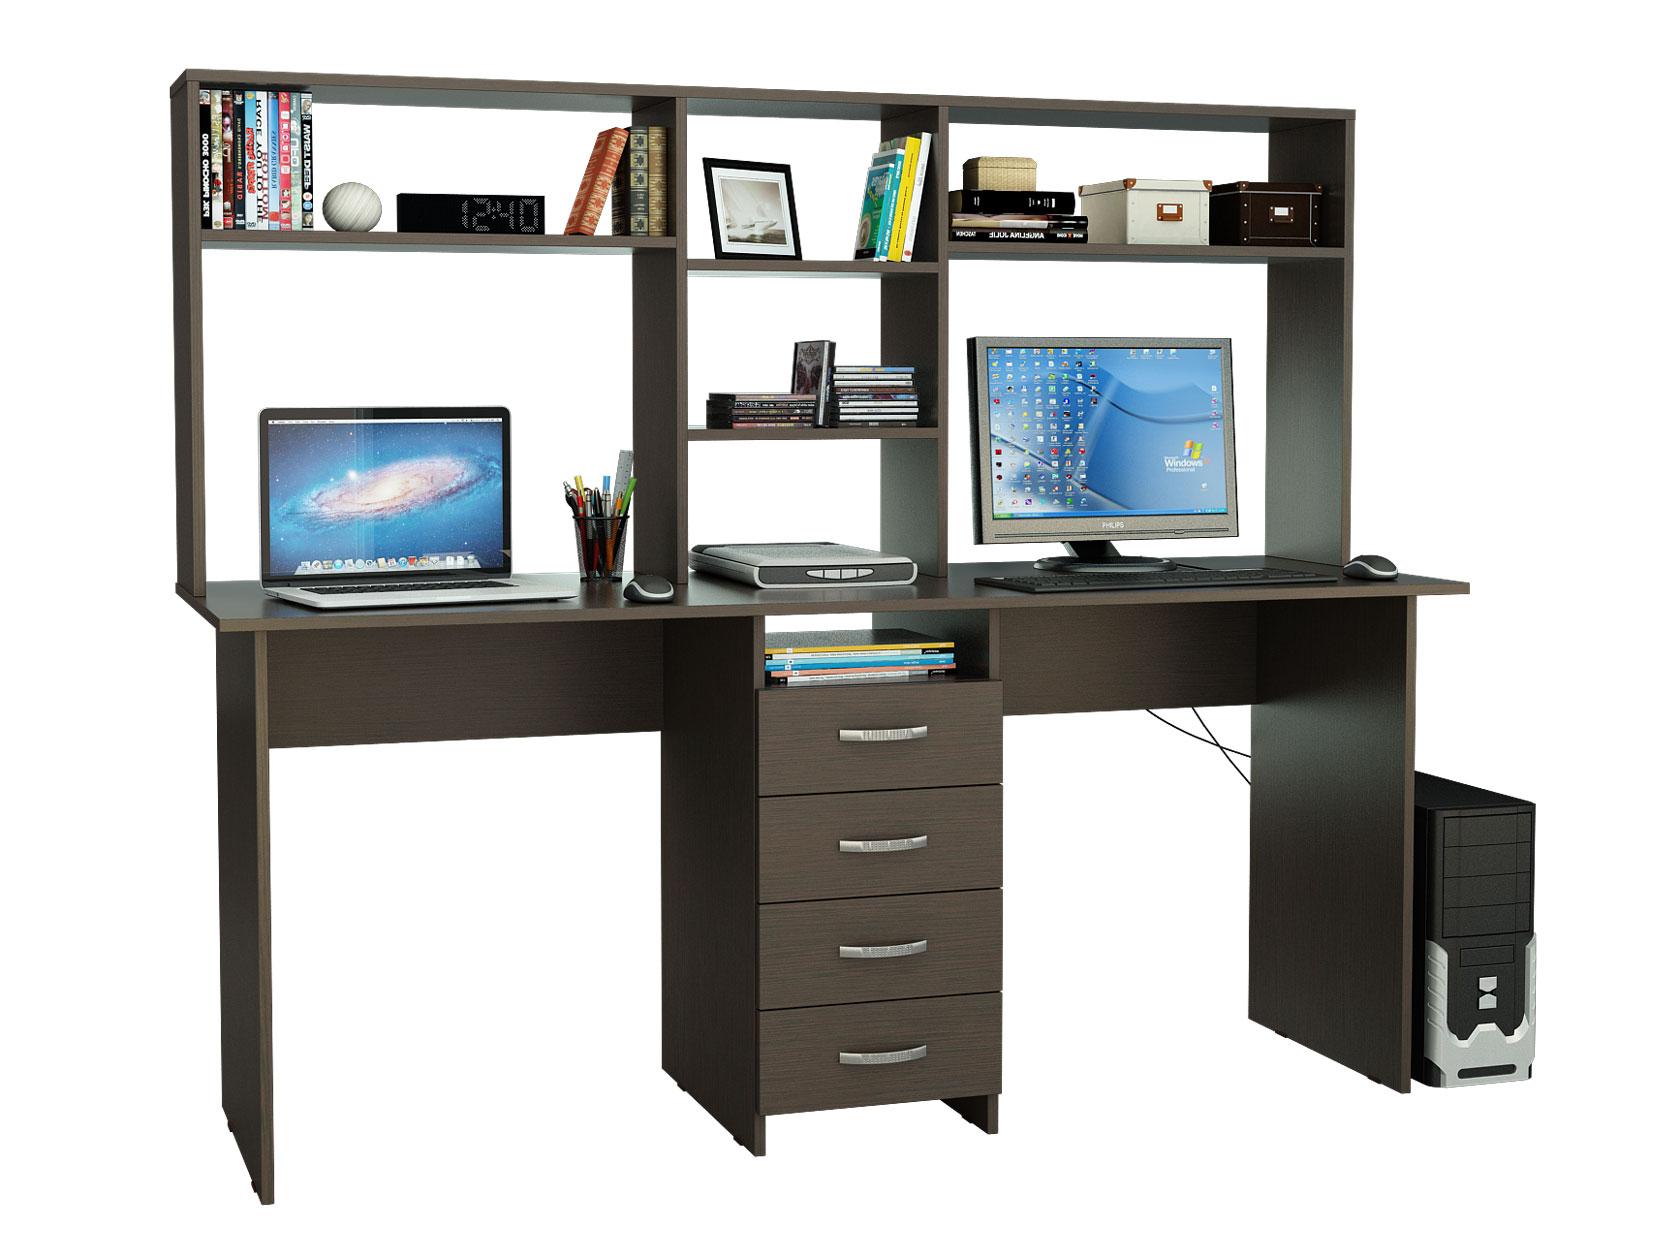 Компьютерный стол МФ Мастер Тандем-2 174,8x60x141,8, венге